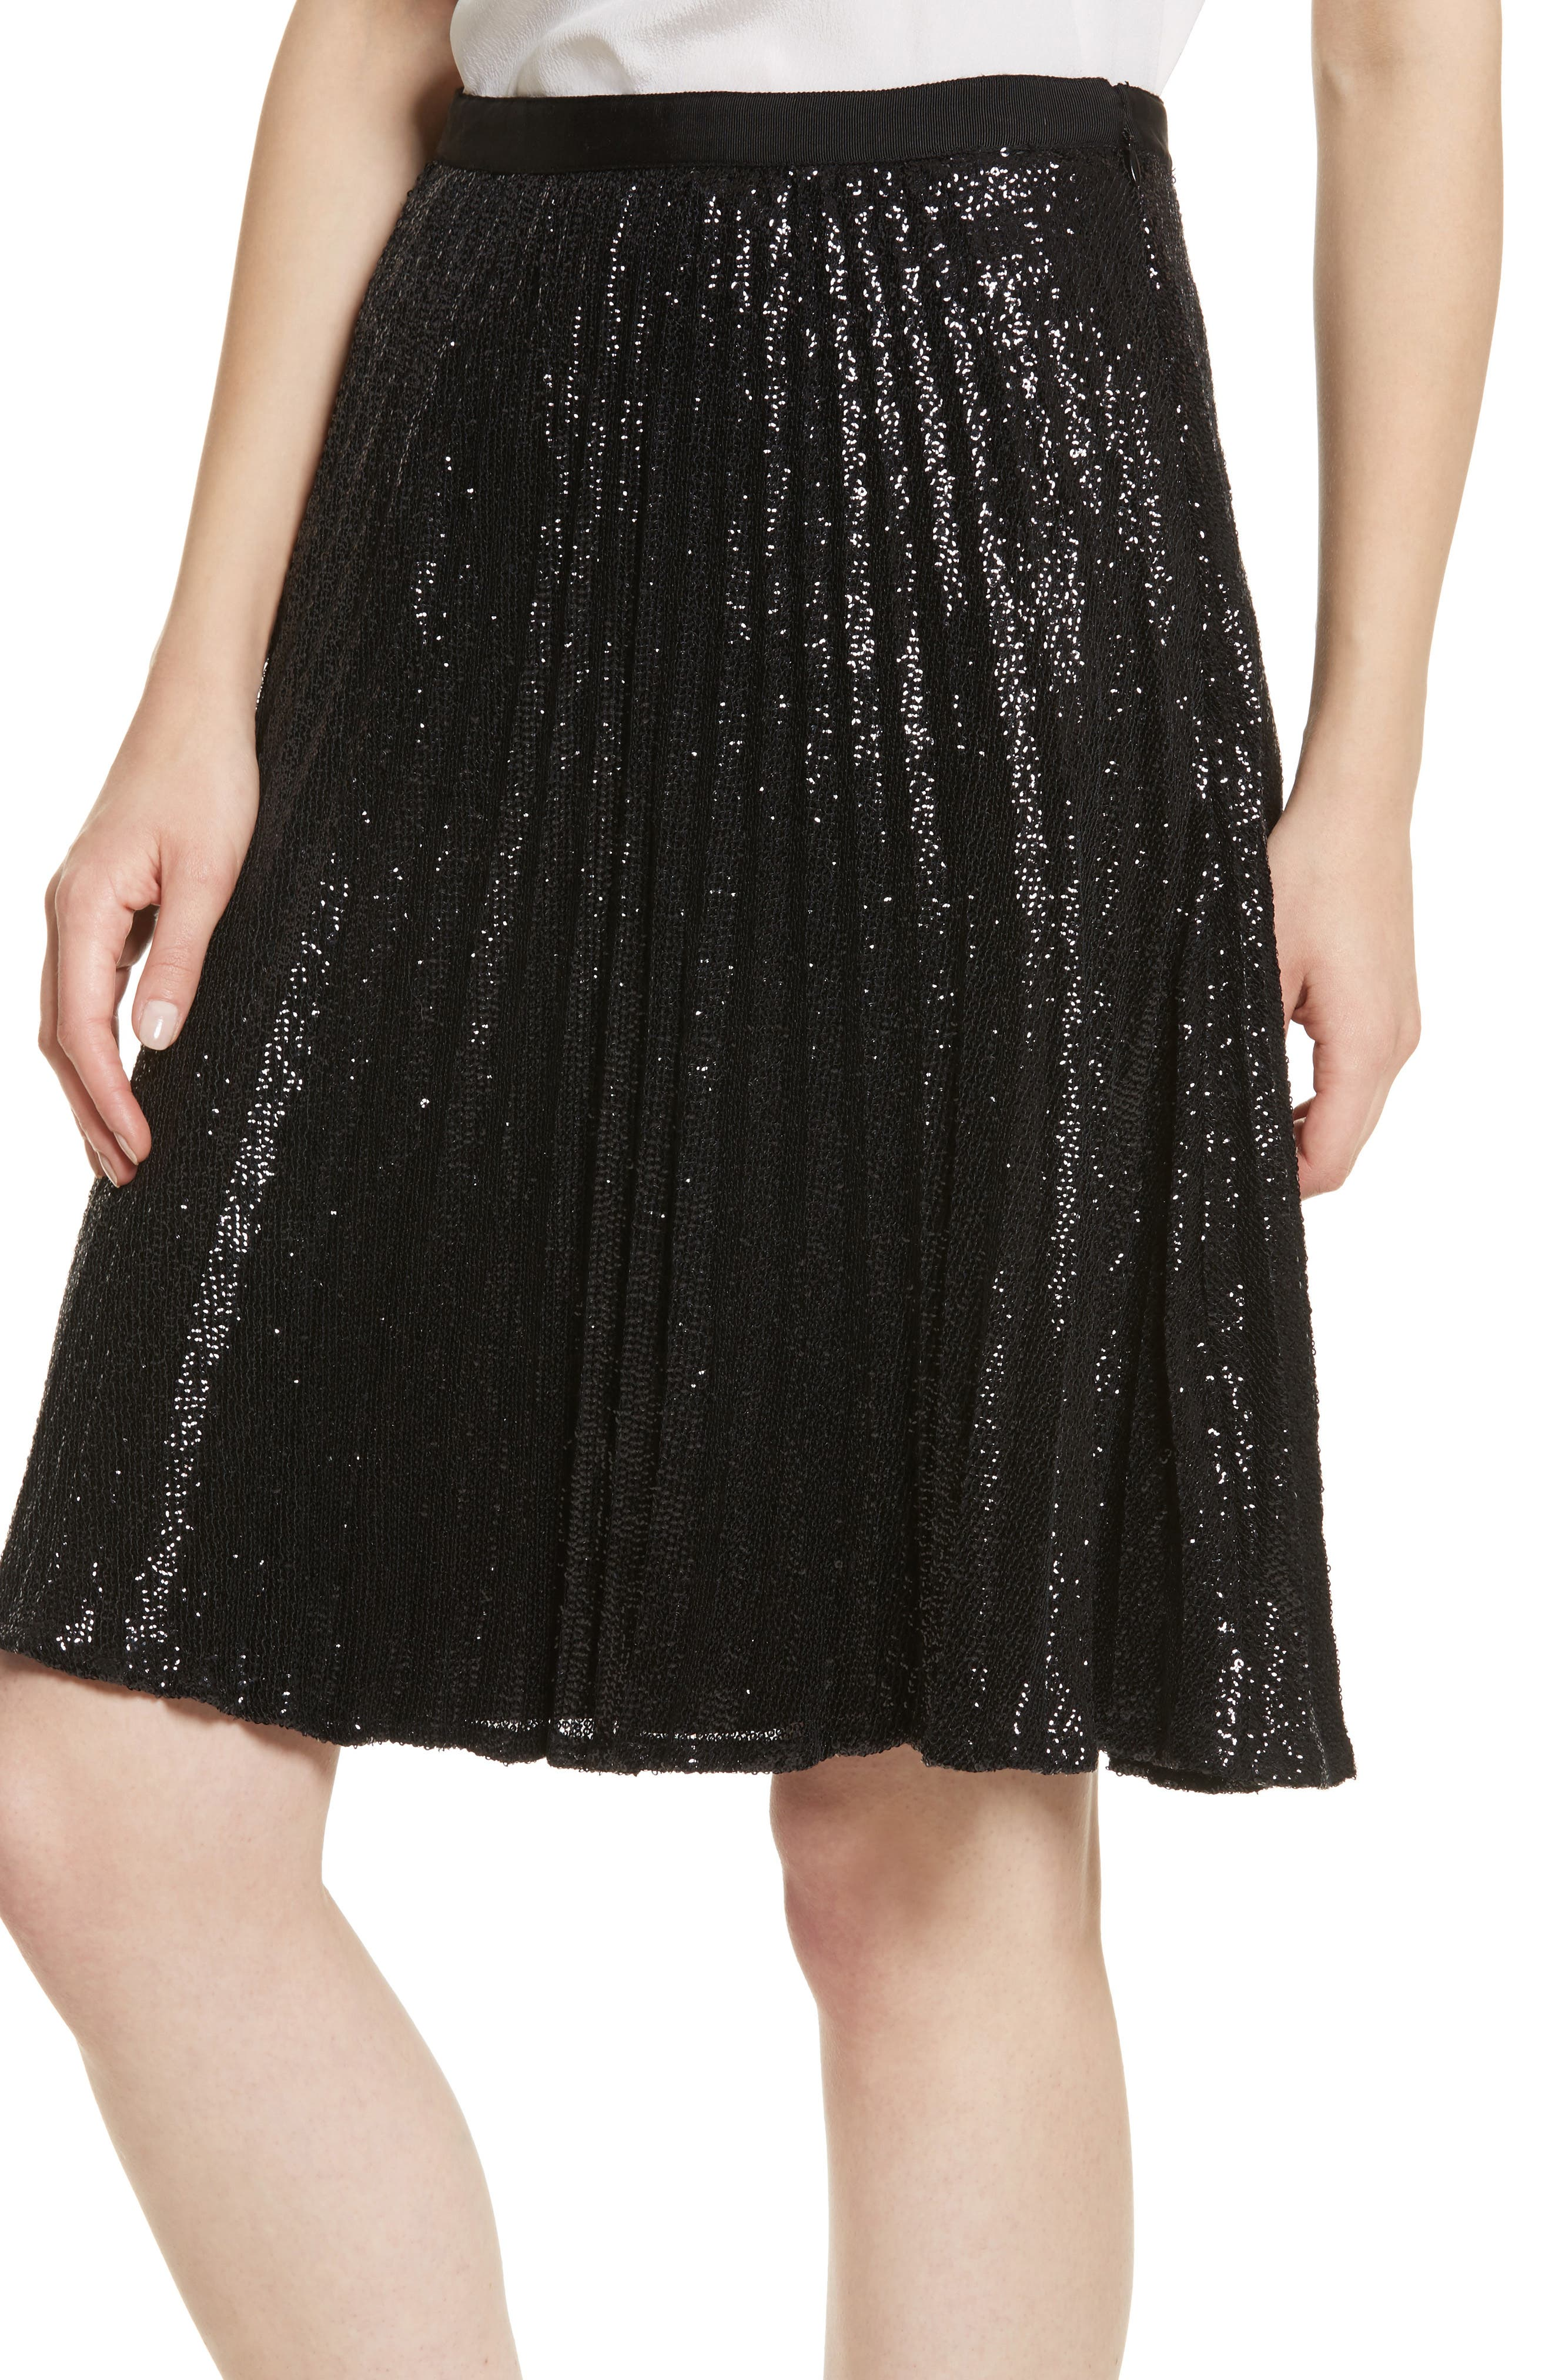 Jadian Metallic Pleat Skirt,                             Alternate thumbnail 4, color,                             Caviar